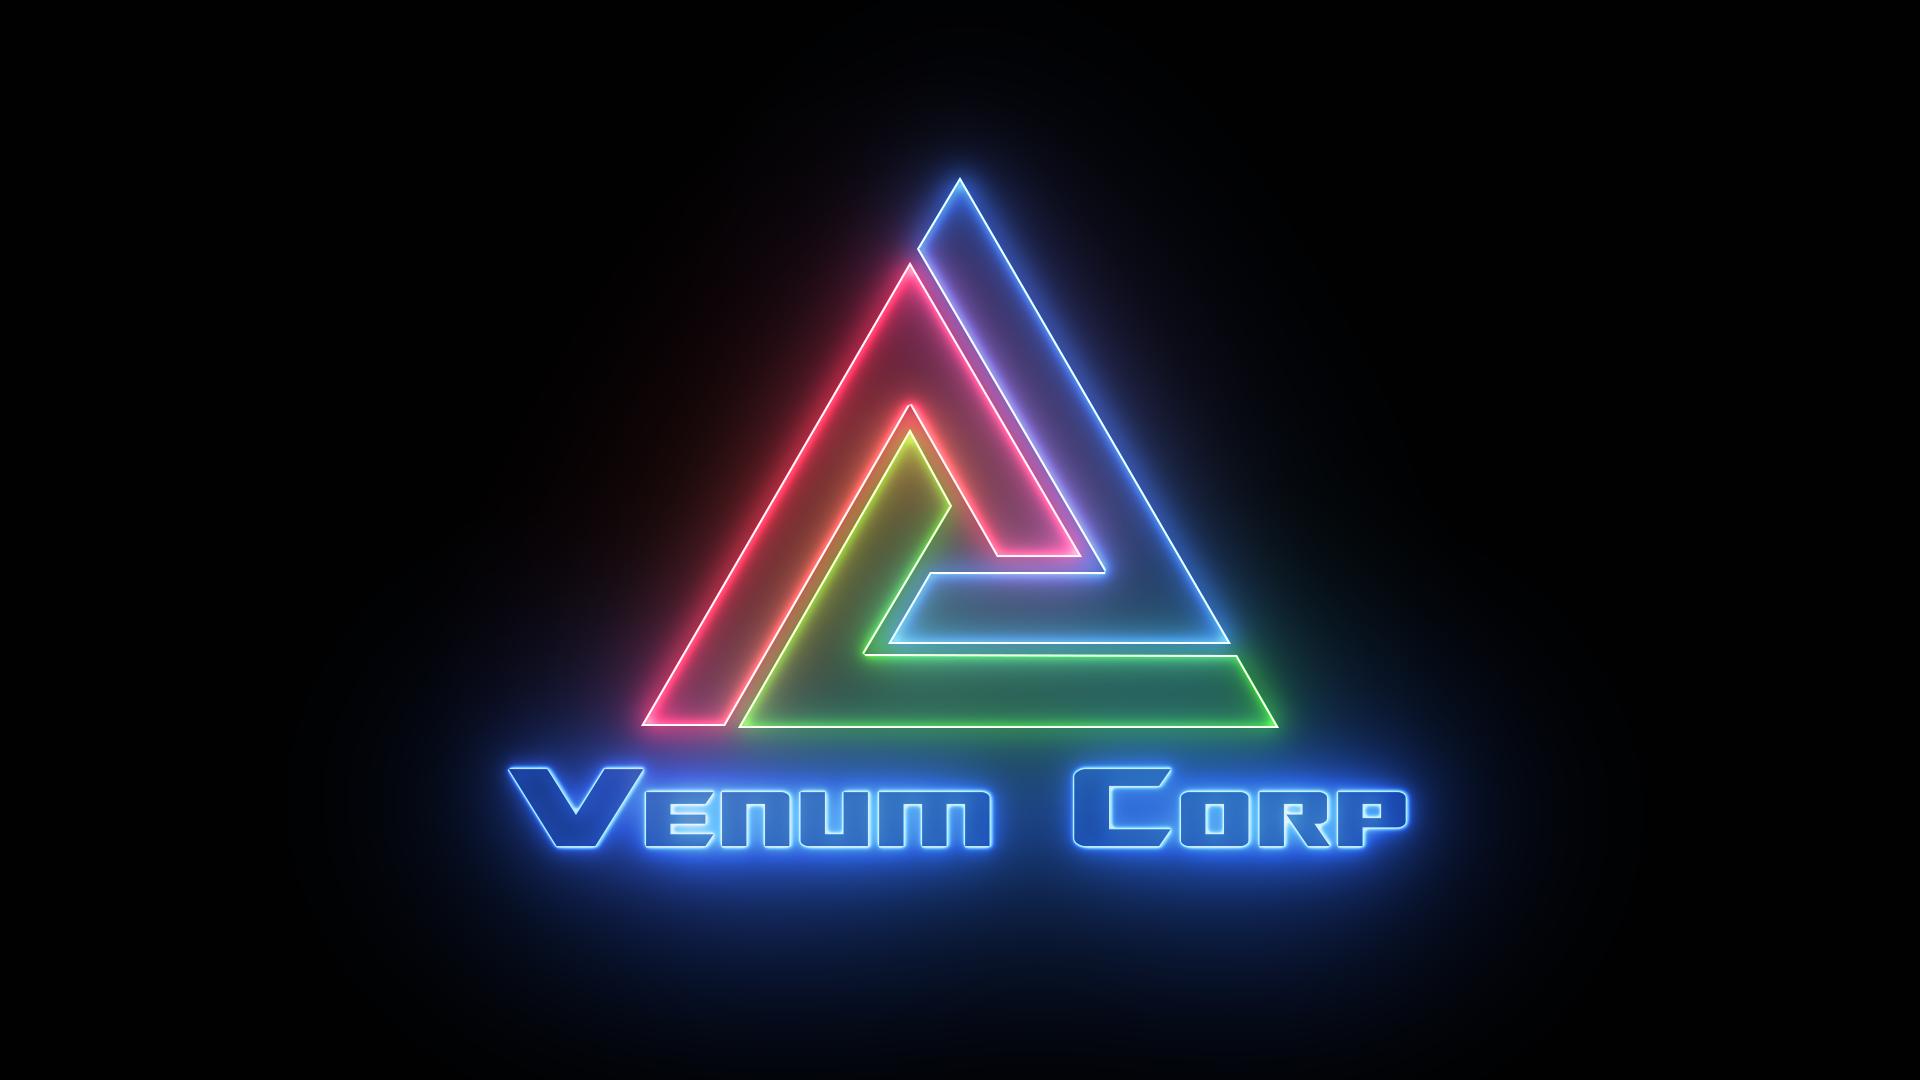 Venom_Corp_-_Neon-tri-logo.png